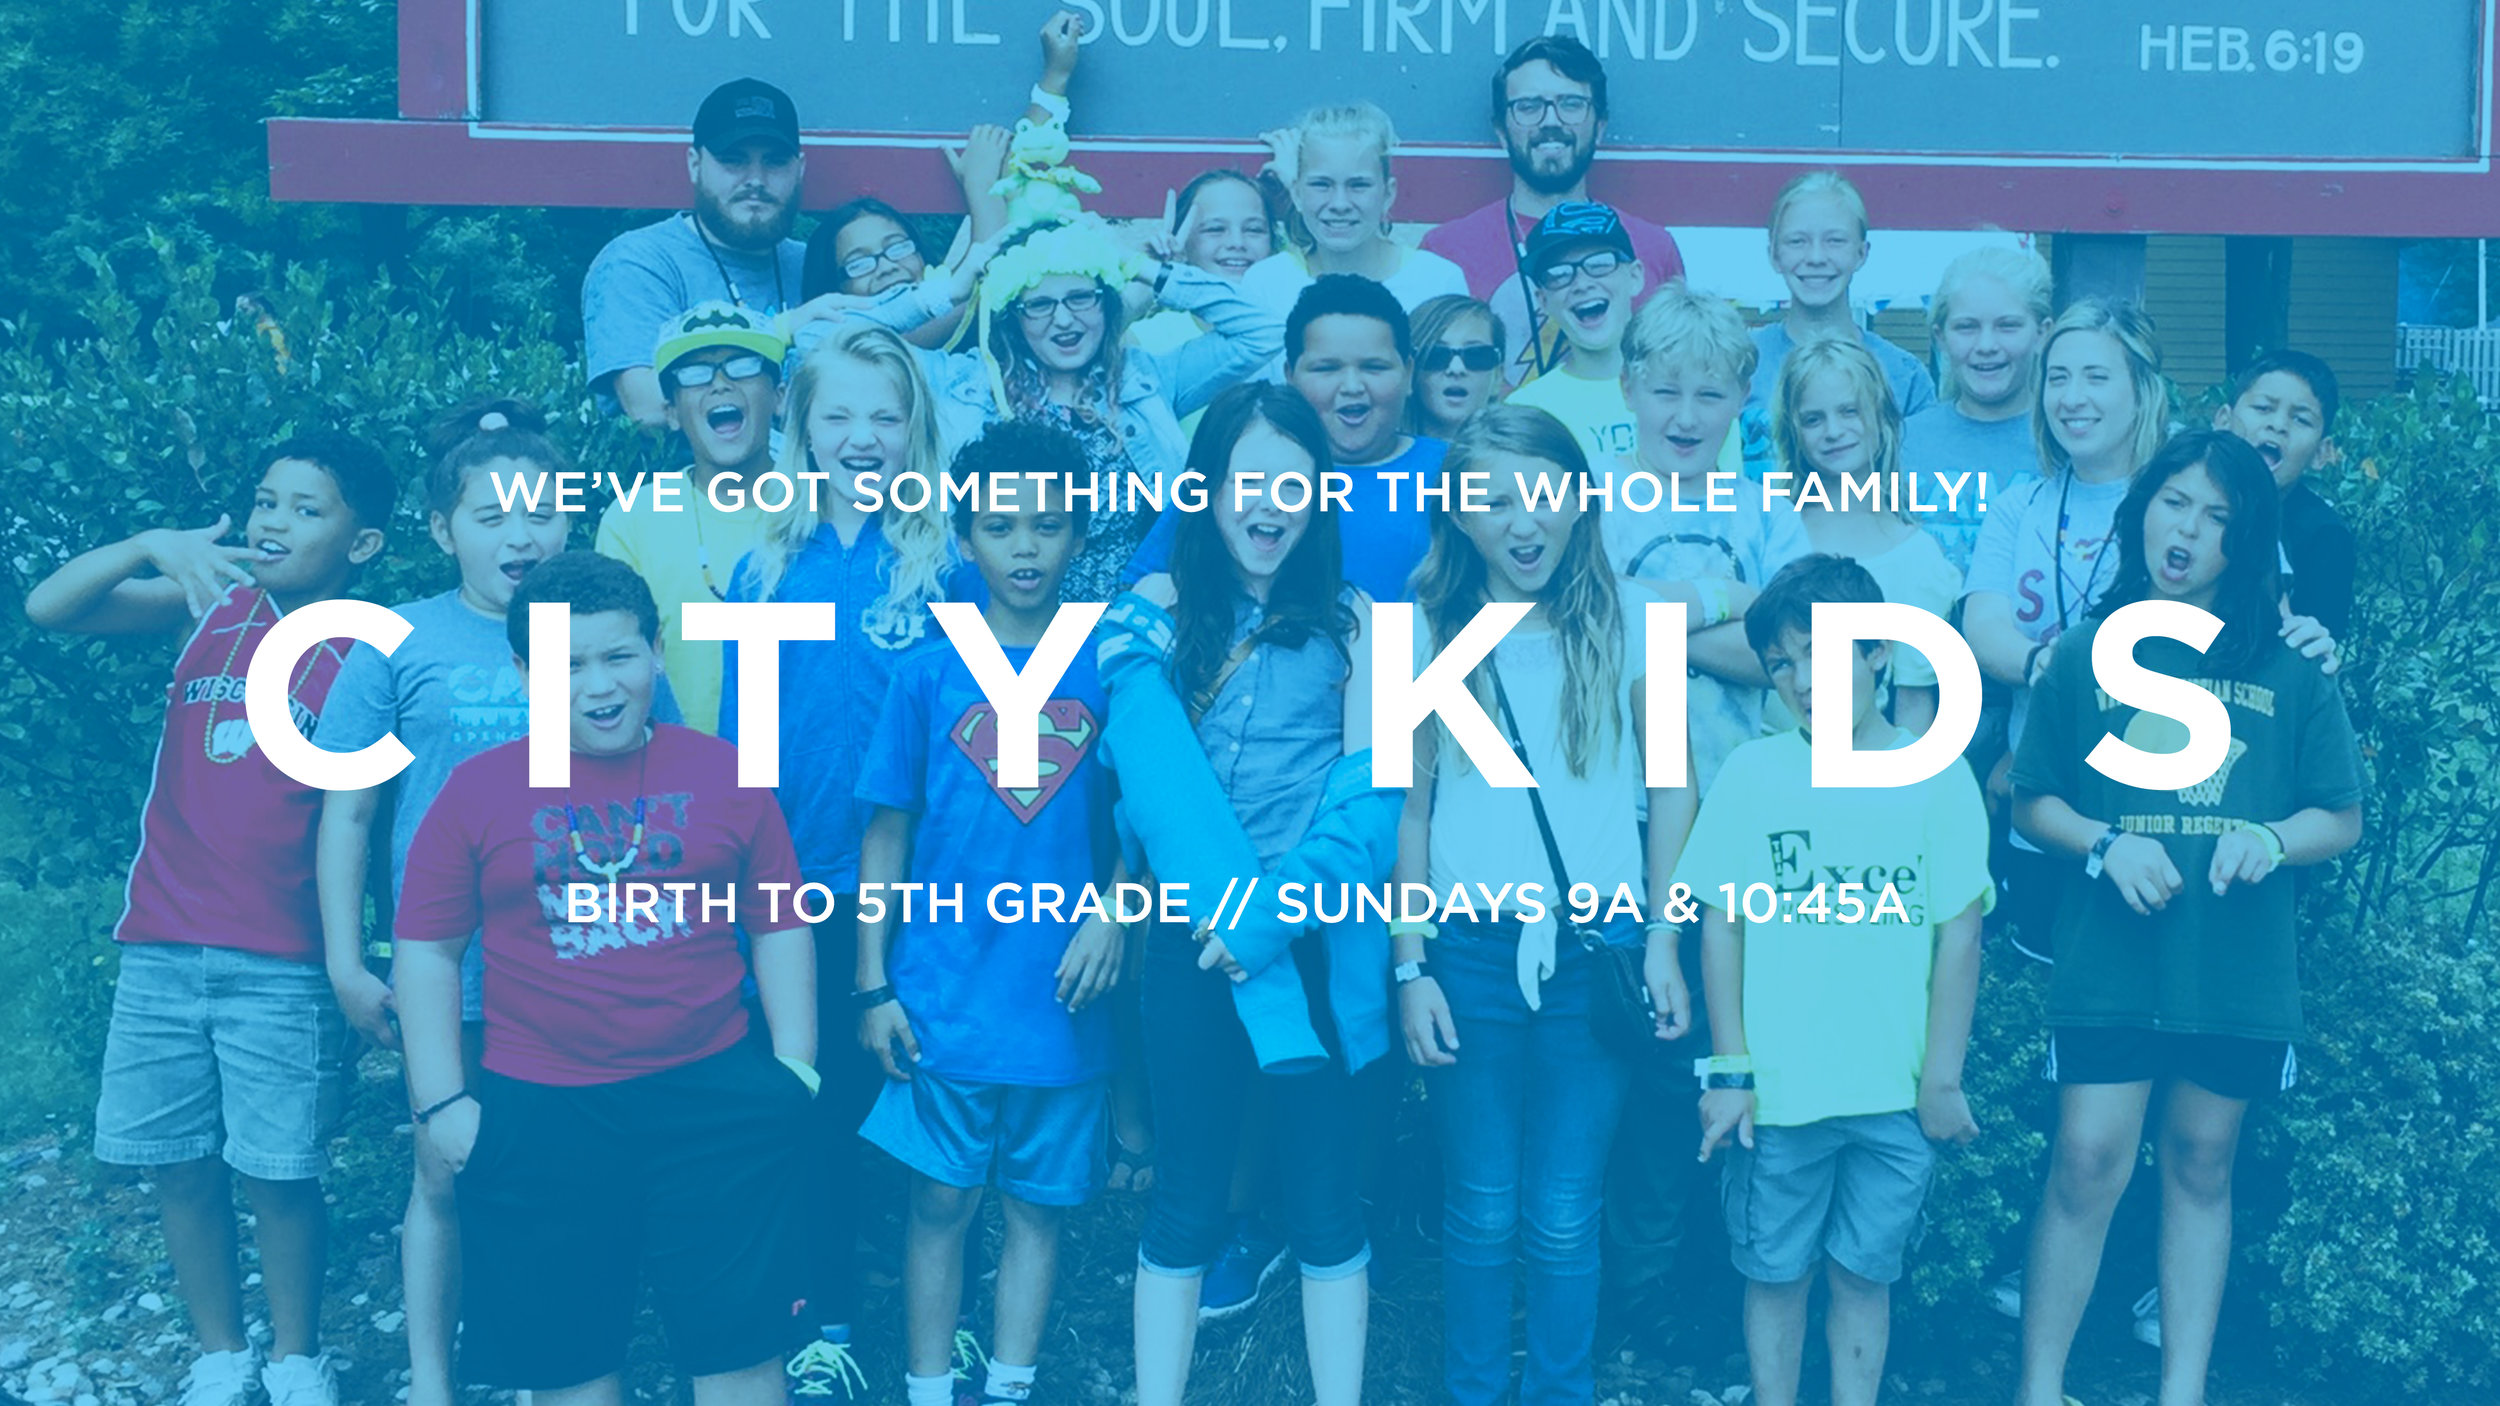 City Kids Pre Roll Announcement Slide.jpg